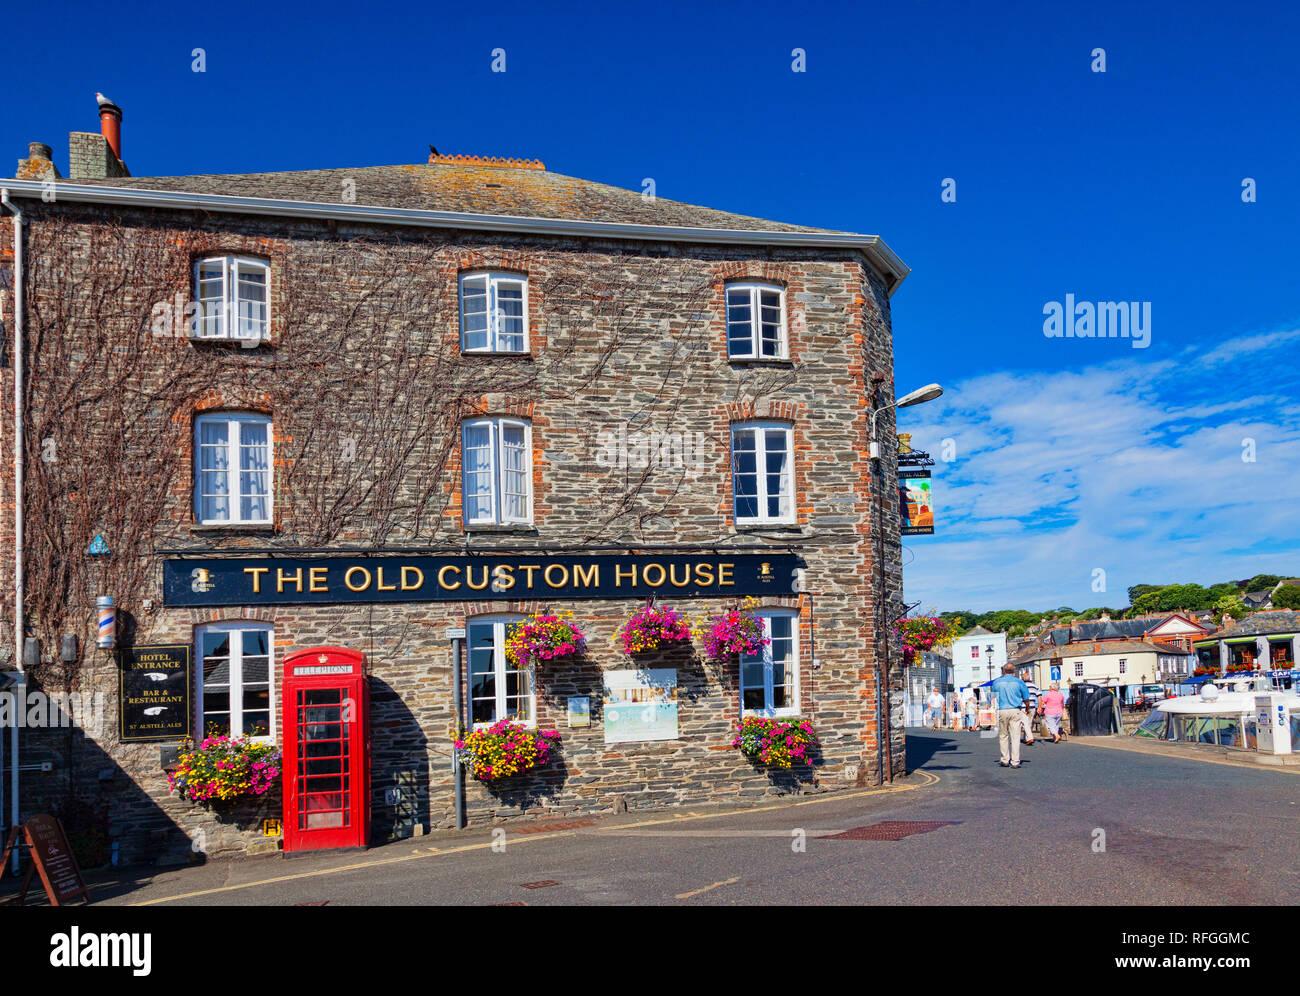 26. Juni 2018: Padstow, Cornwall, Großbritannien - Die alte Custom House Hotel in Padstow, Cornwall, Großbritannien Stockbild